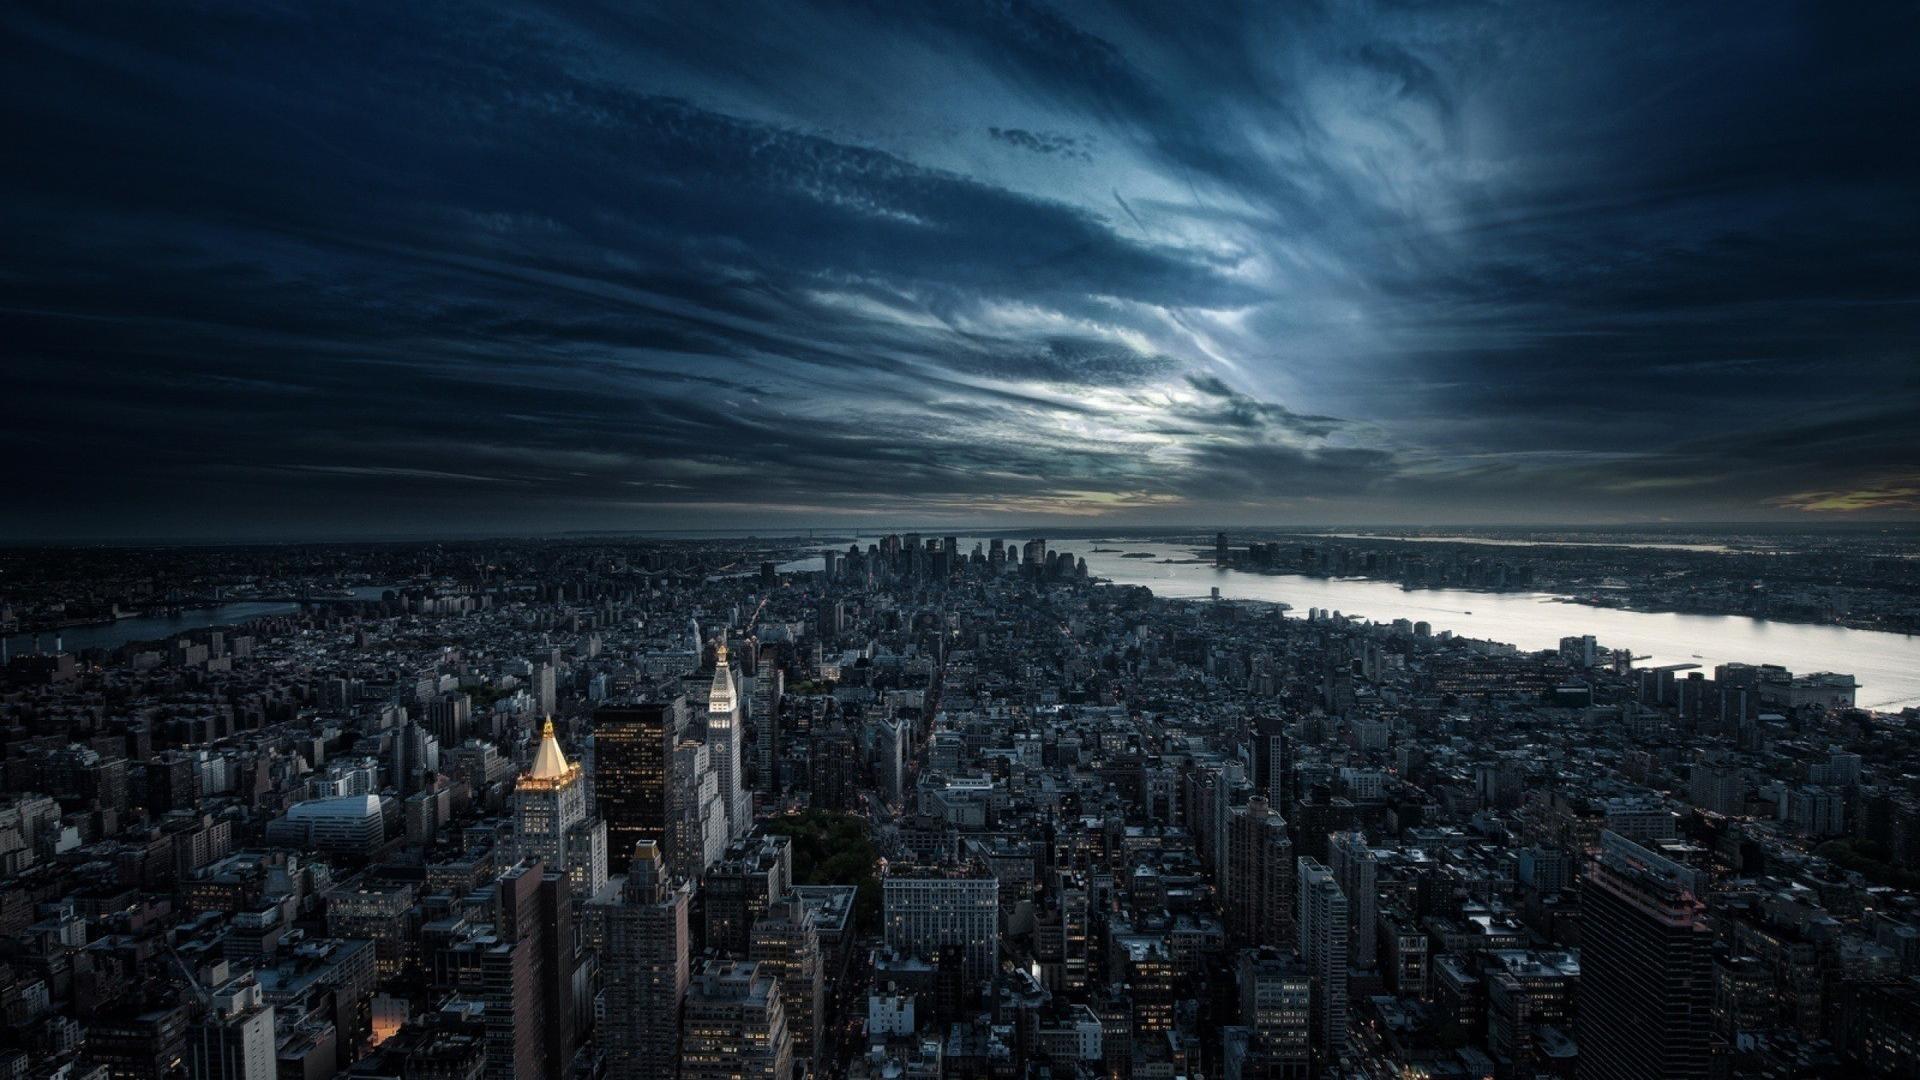 New York Epic Landscape : Desktop and mobile wallpaper : Wallippo